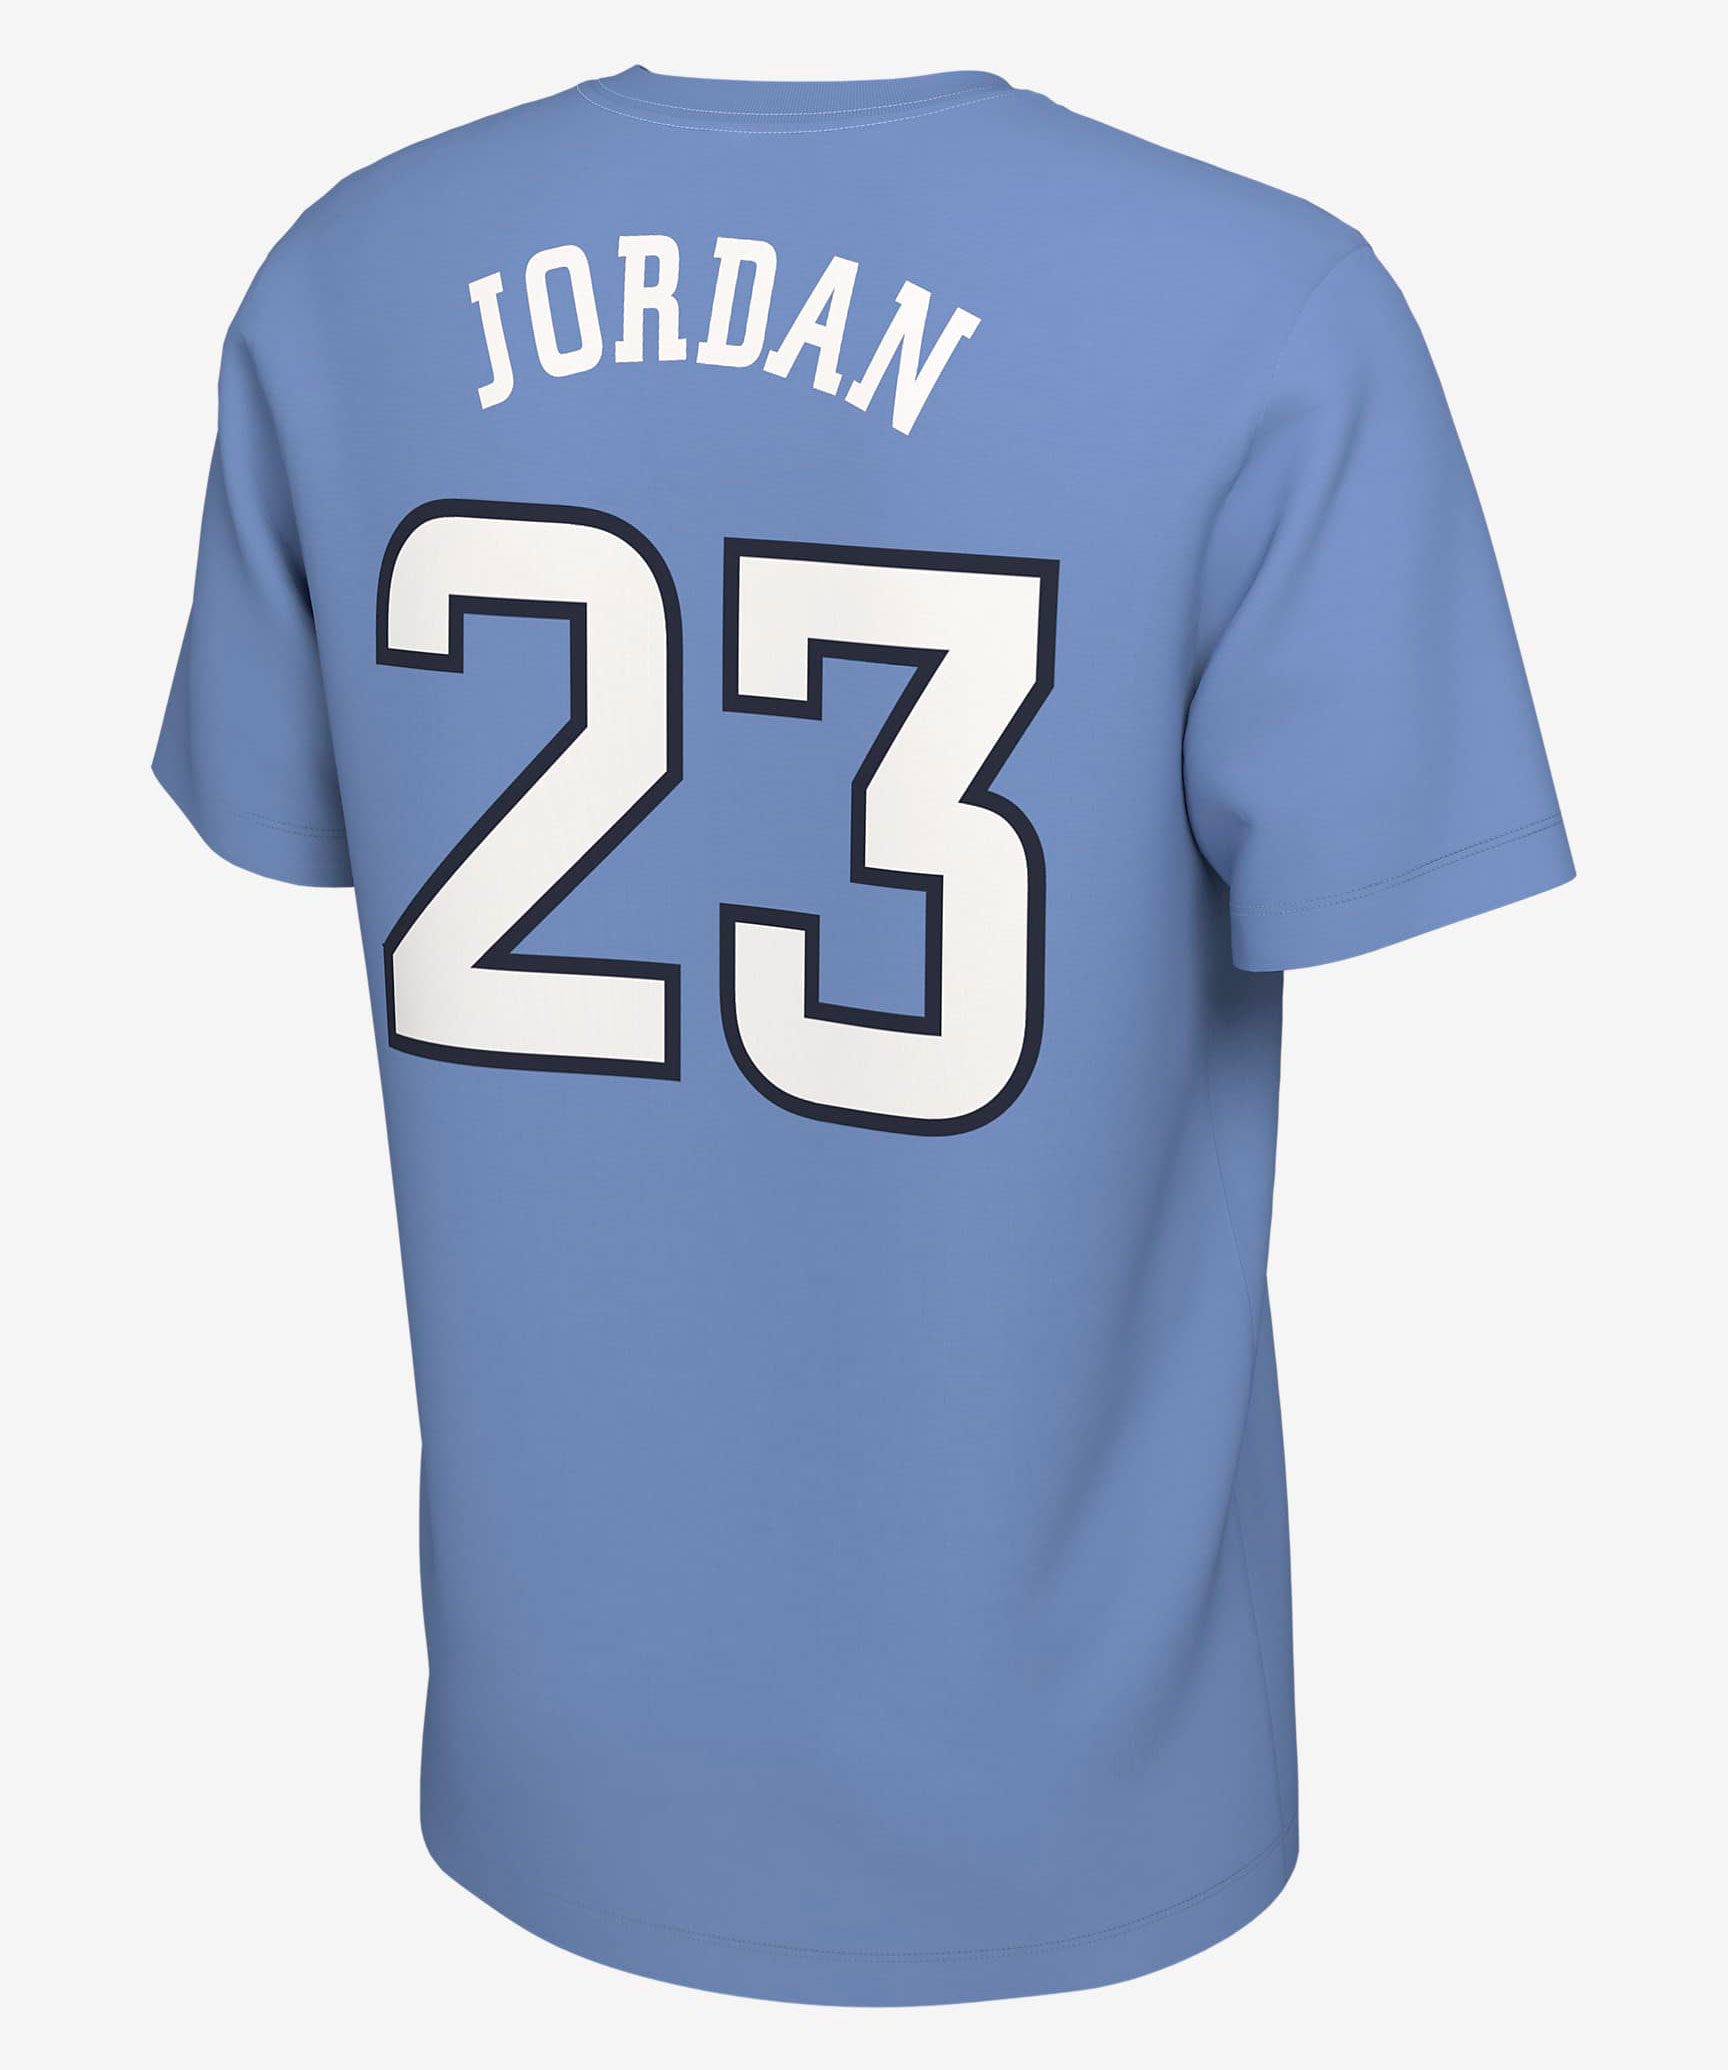 michael-jordan-unc-tar-heels-college-shirt-carolina-blue-2